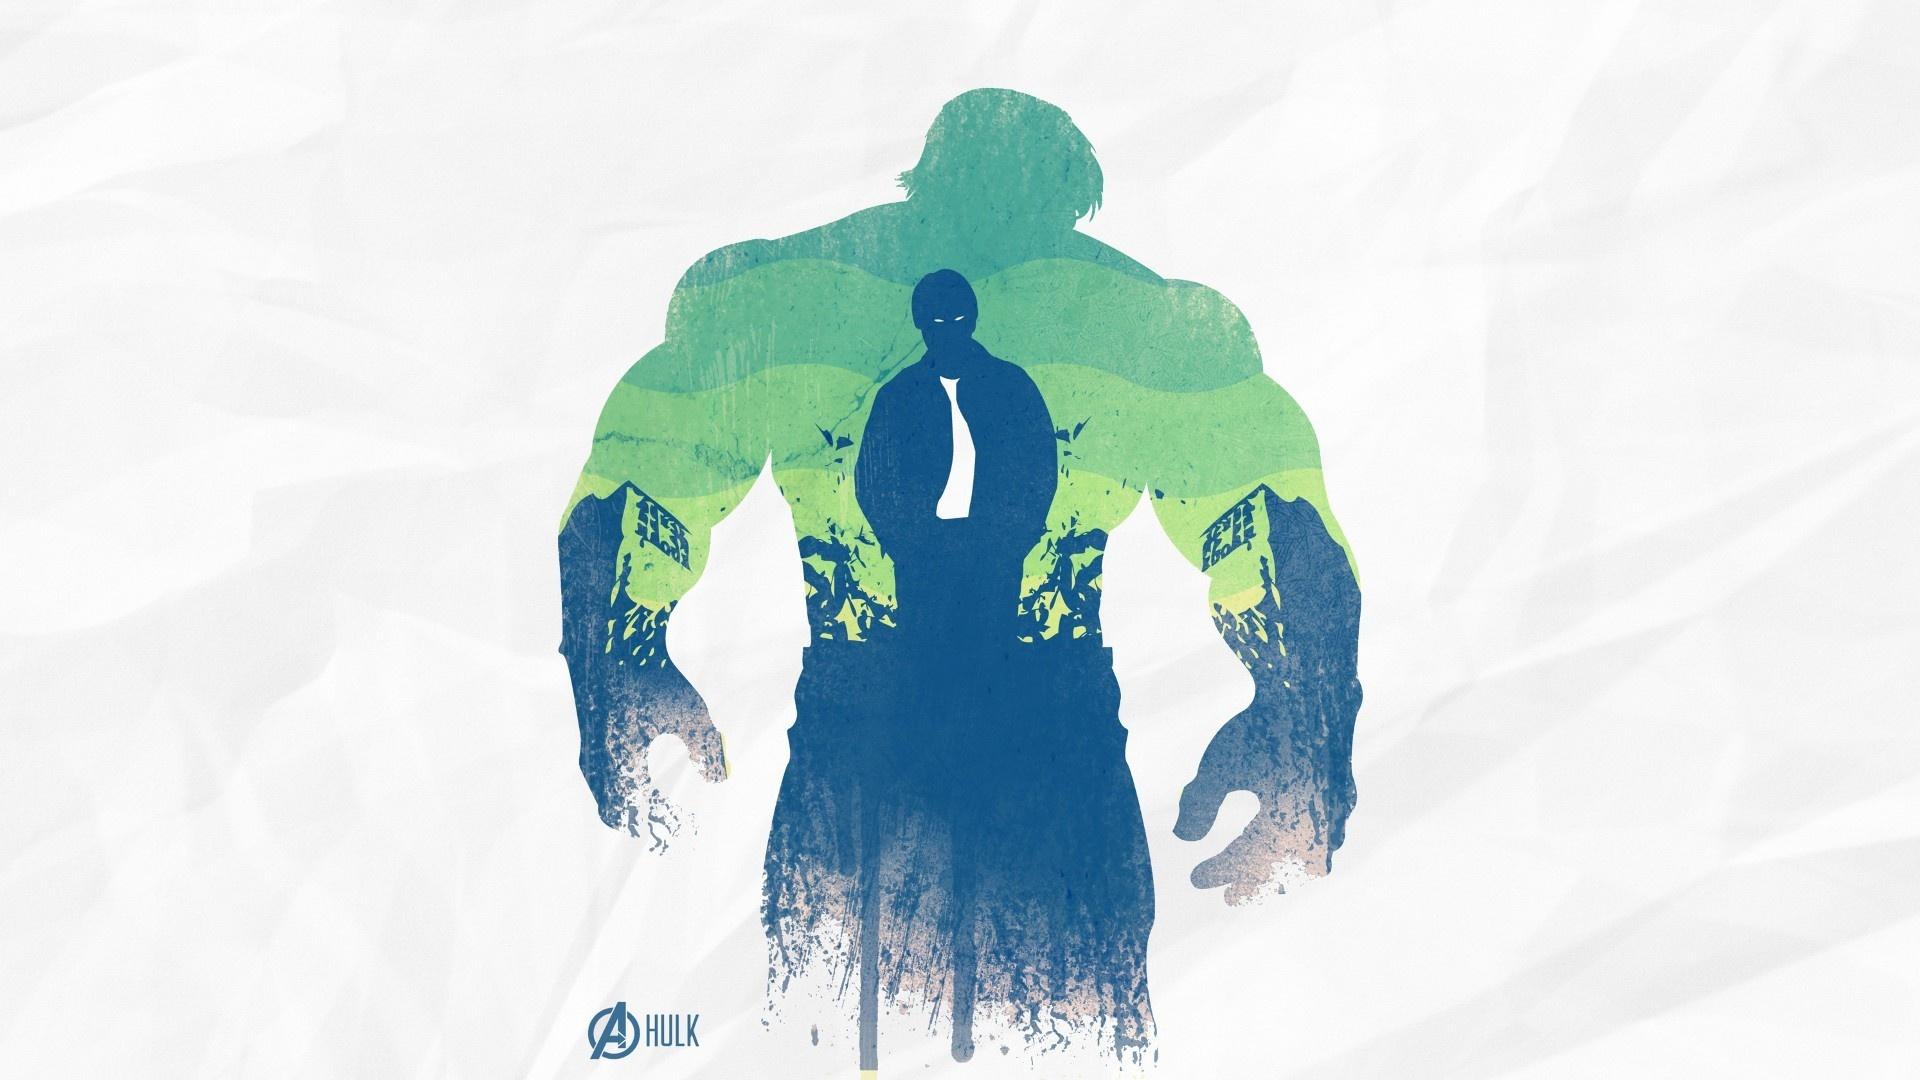 Hulk free background